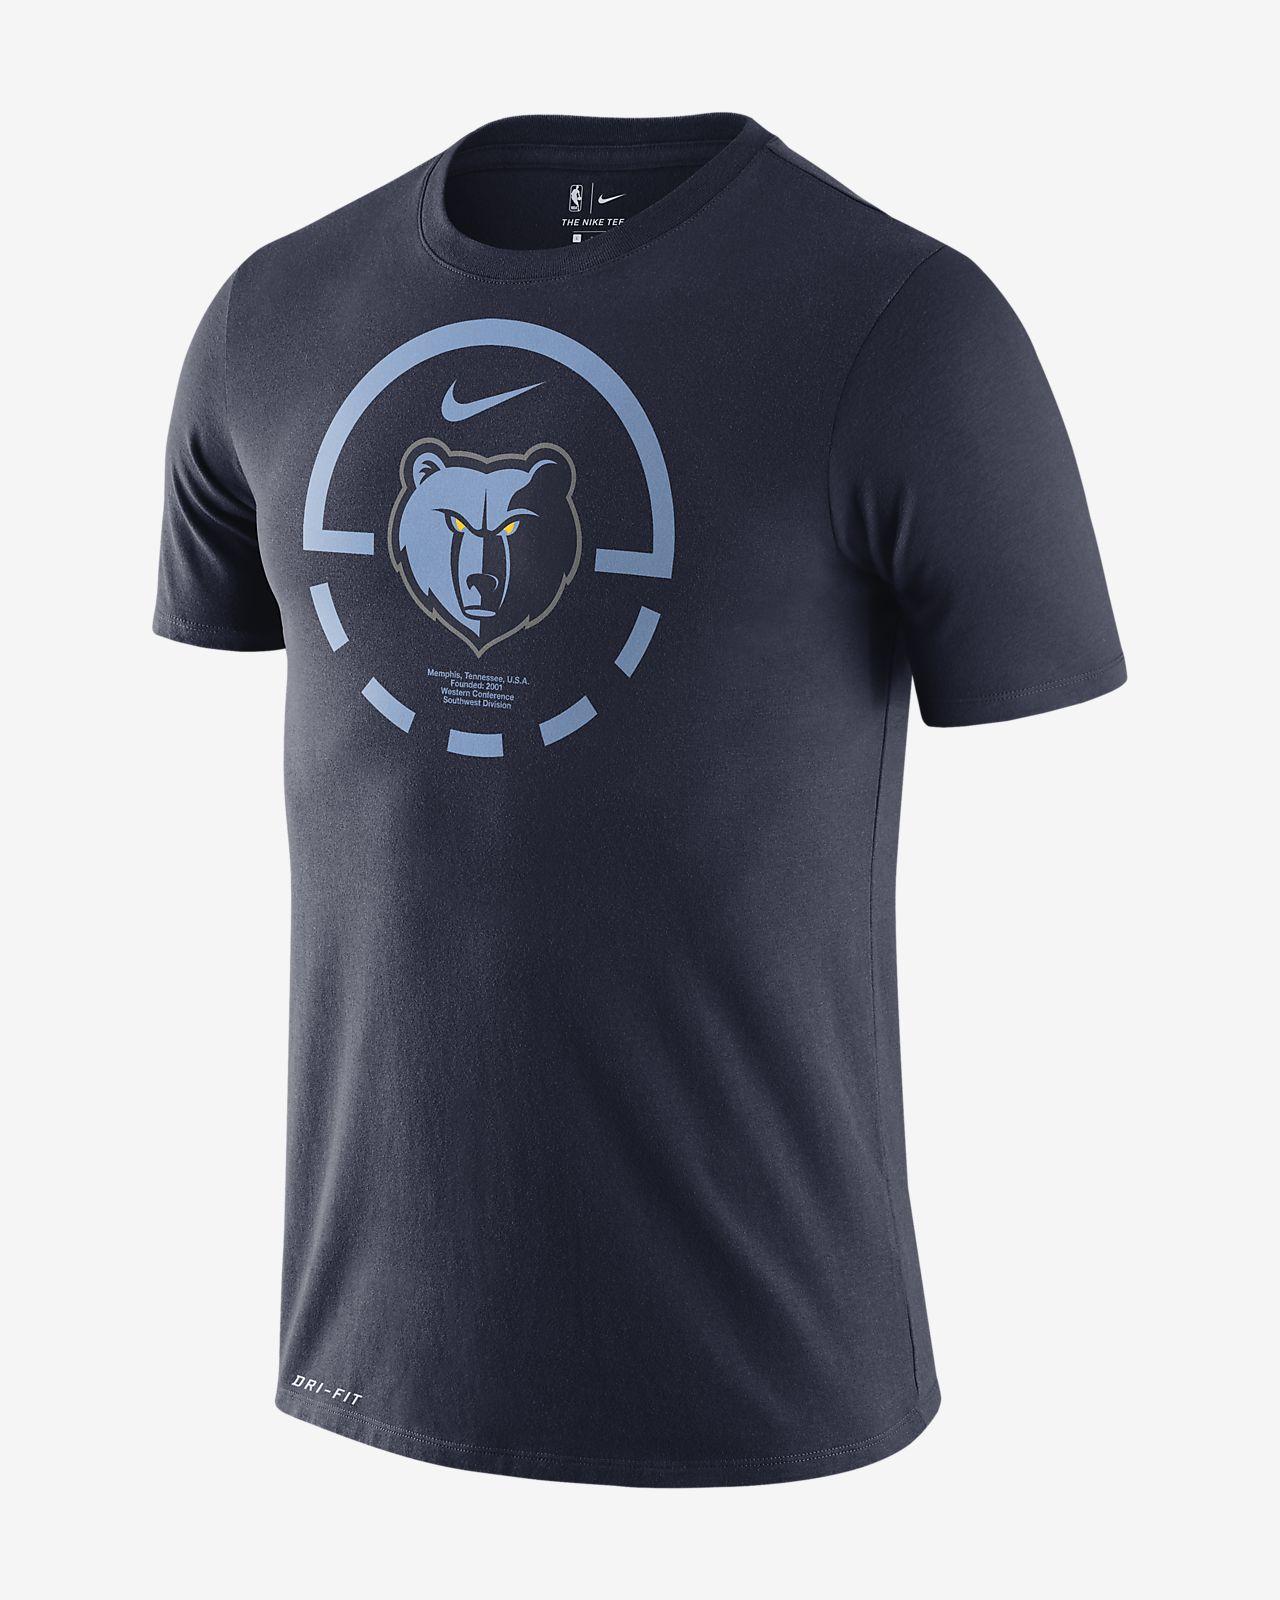 Memphis Grizzlies Nike Dri-FIT Men's NBA T-Shirt